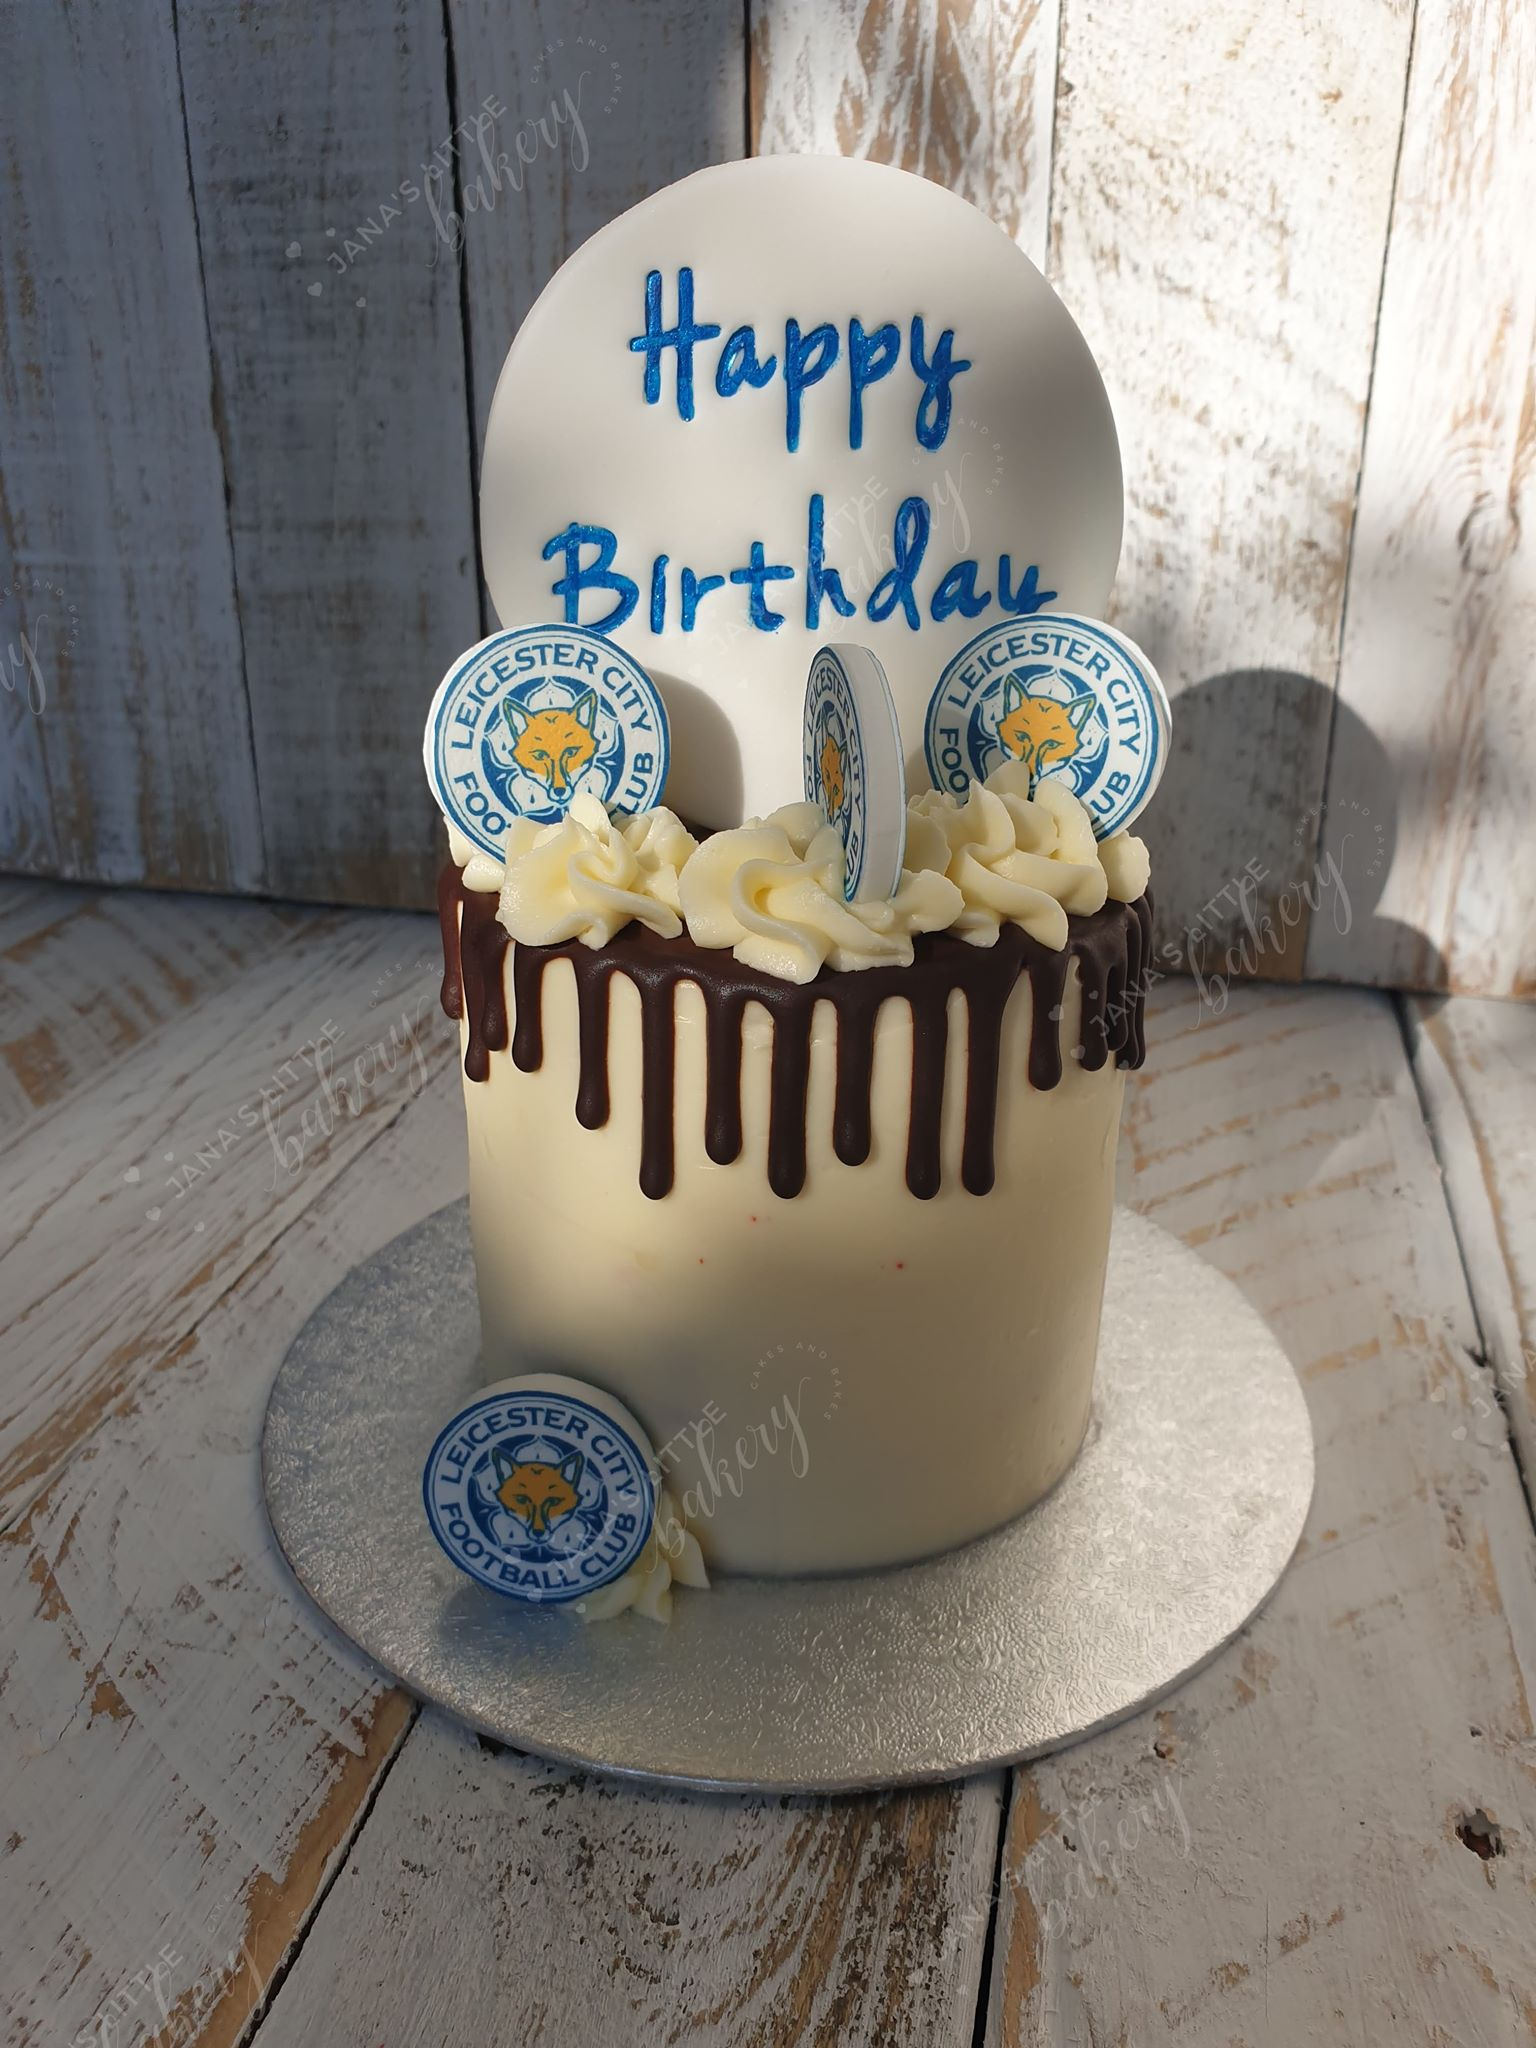 Mini Leicester City